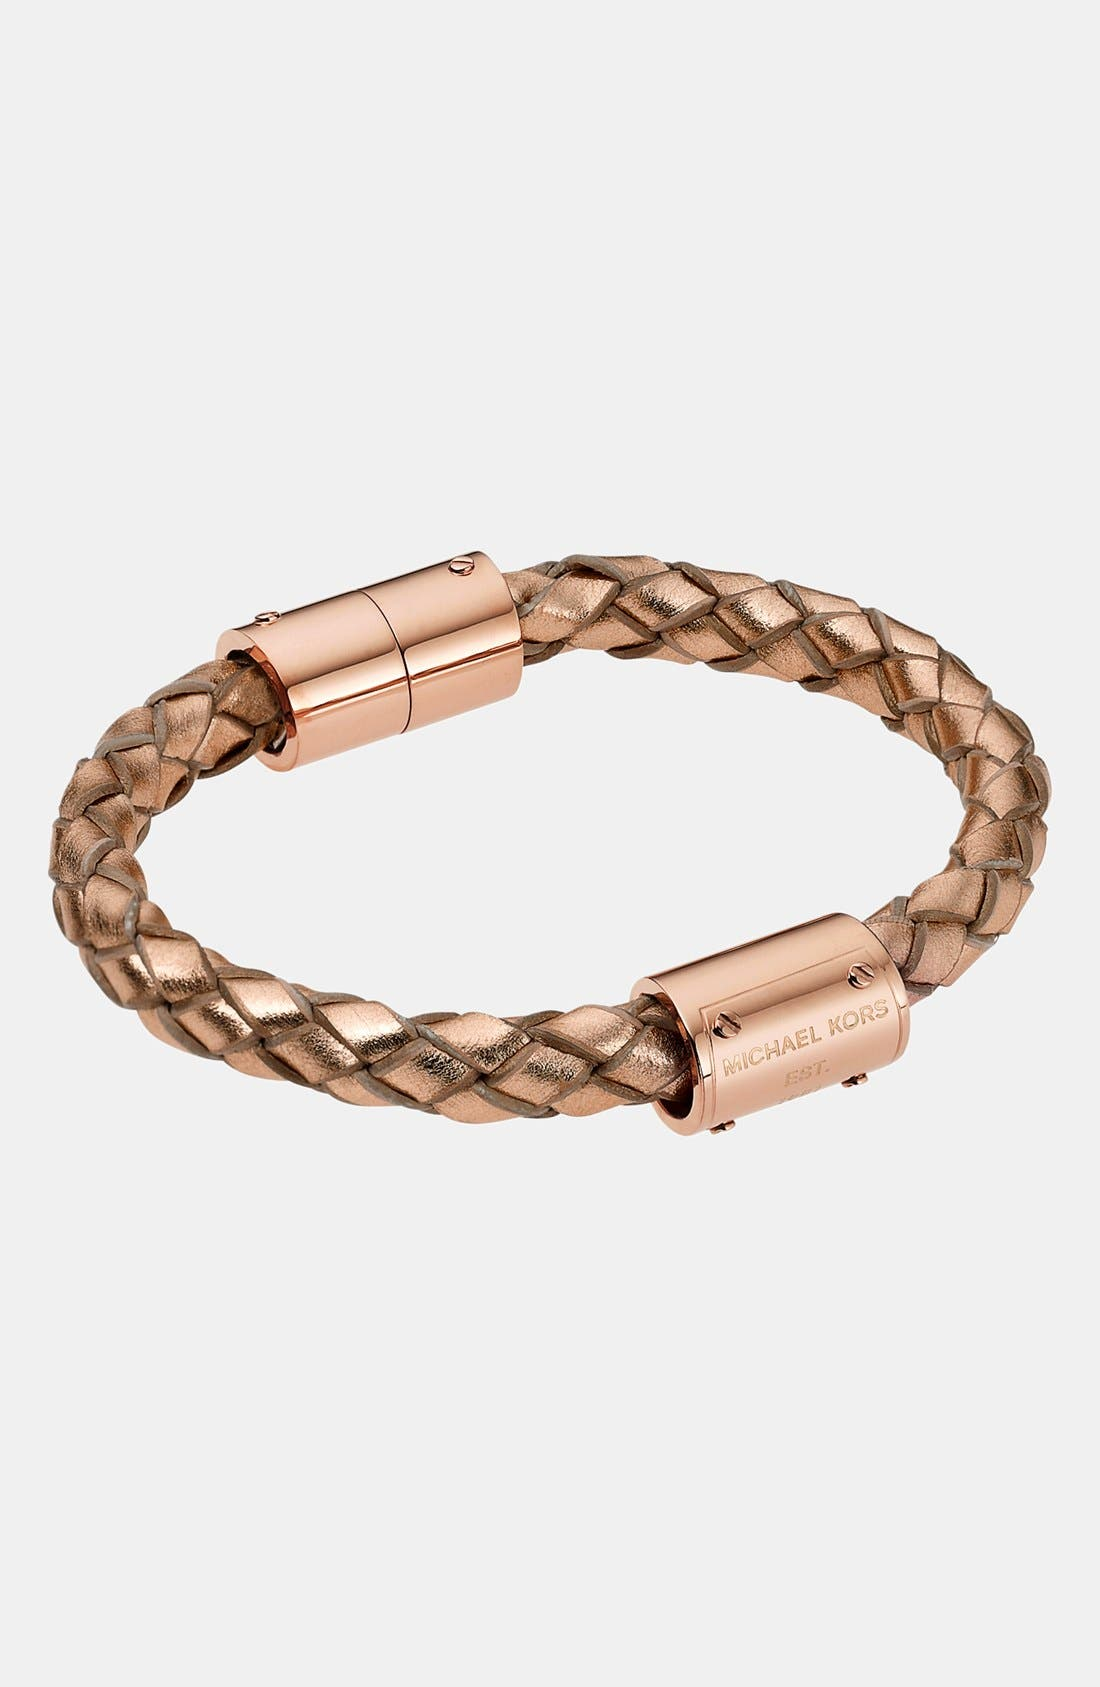 Main Image - Michael Kors 'Skorpios' Metallic Leather Rope Bracelet